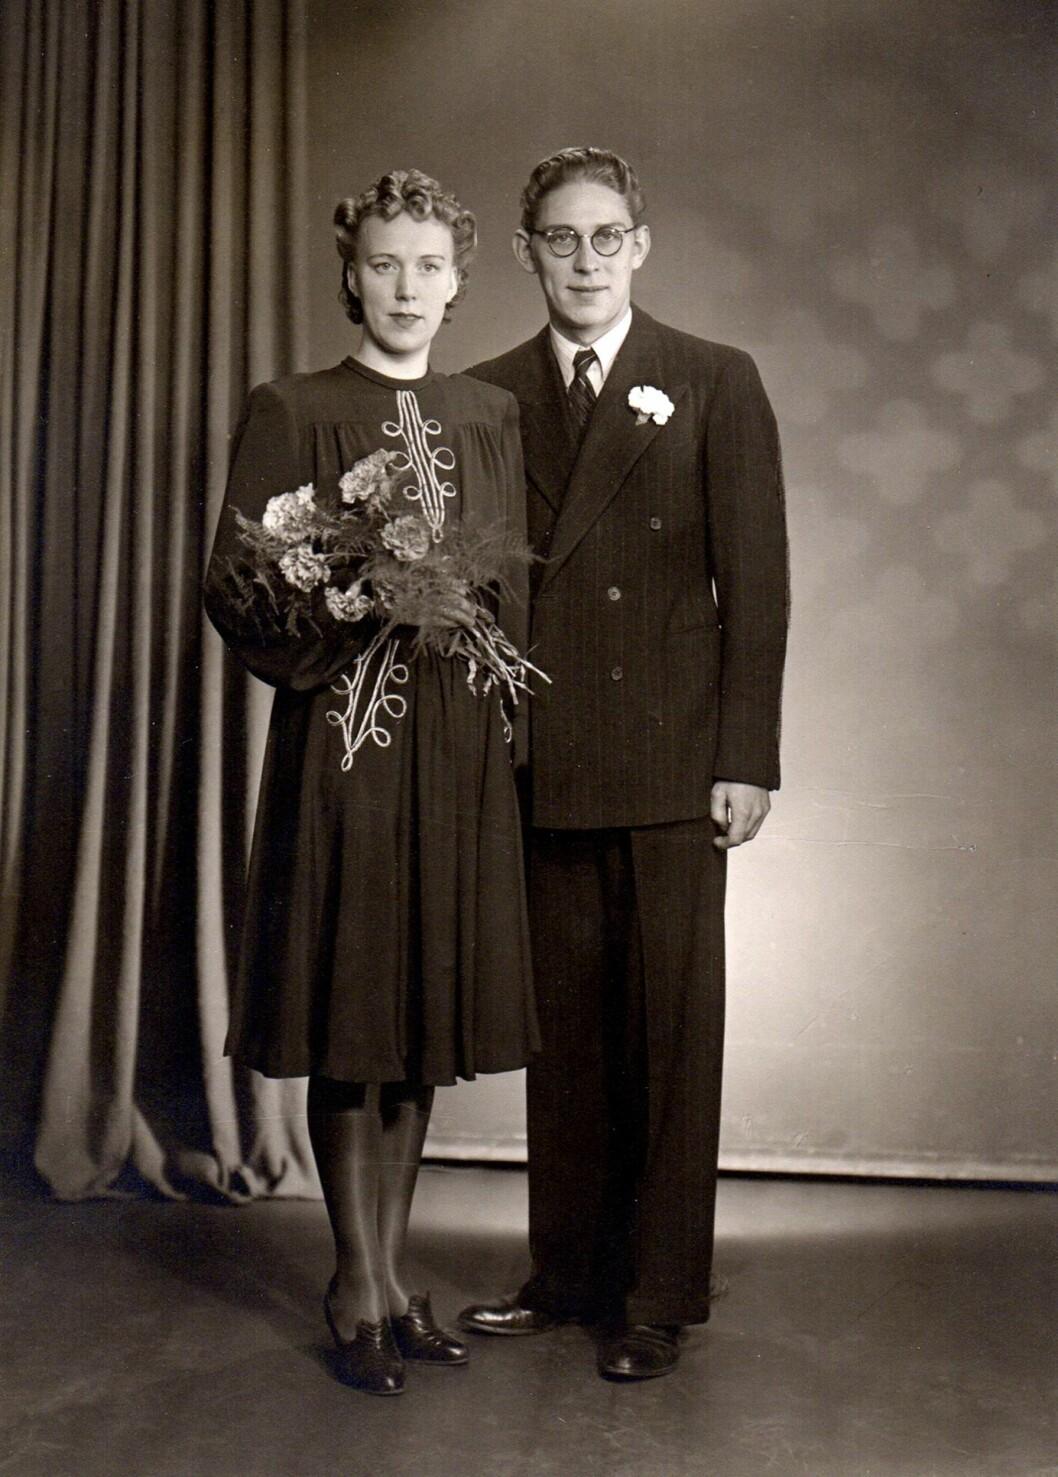 GIFT UNDER KRIGEN: Christians besteforeldre, Mary og Sverre Lindegård giftet seg 22. november 1942. Bare et halvt år senere måtte de flykte til Sverige. Foto: Tor Lindseth / Se og Hør